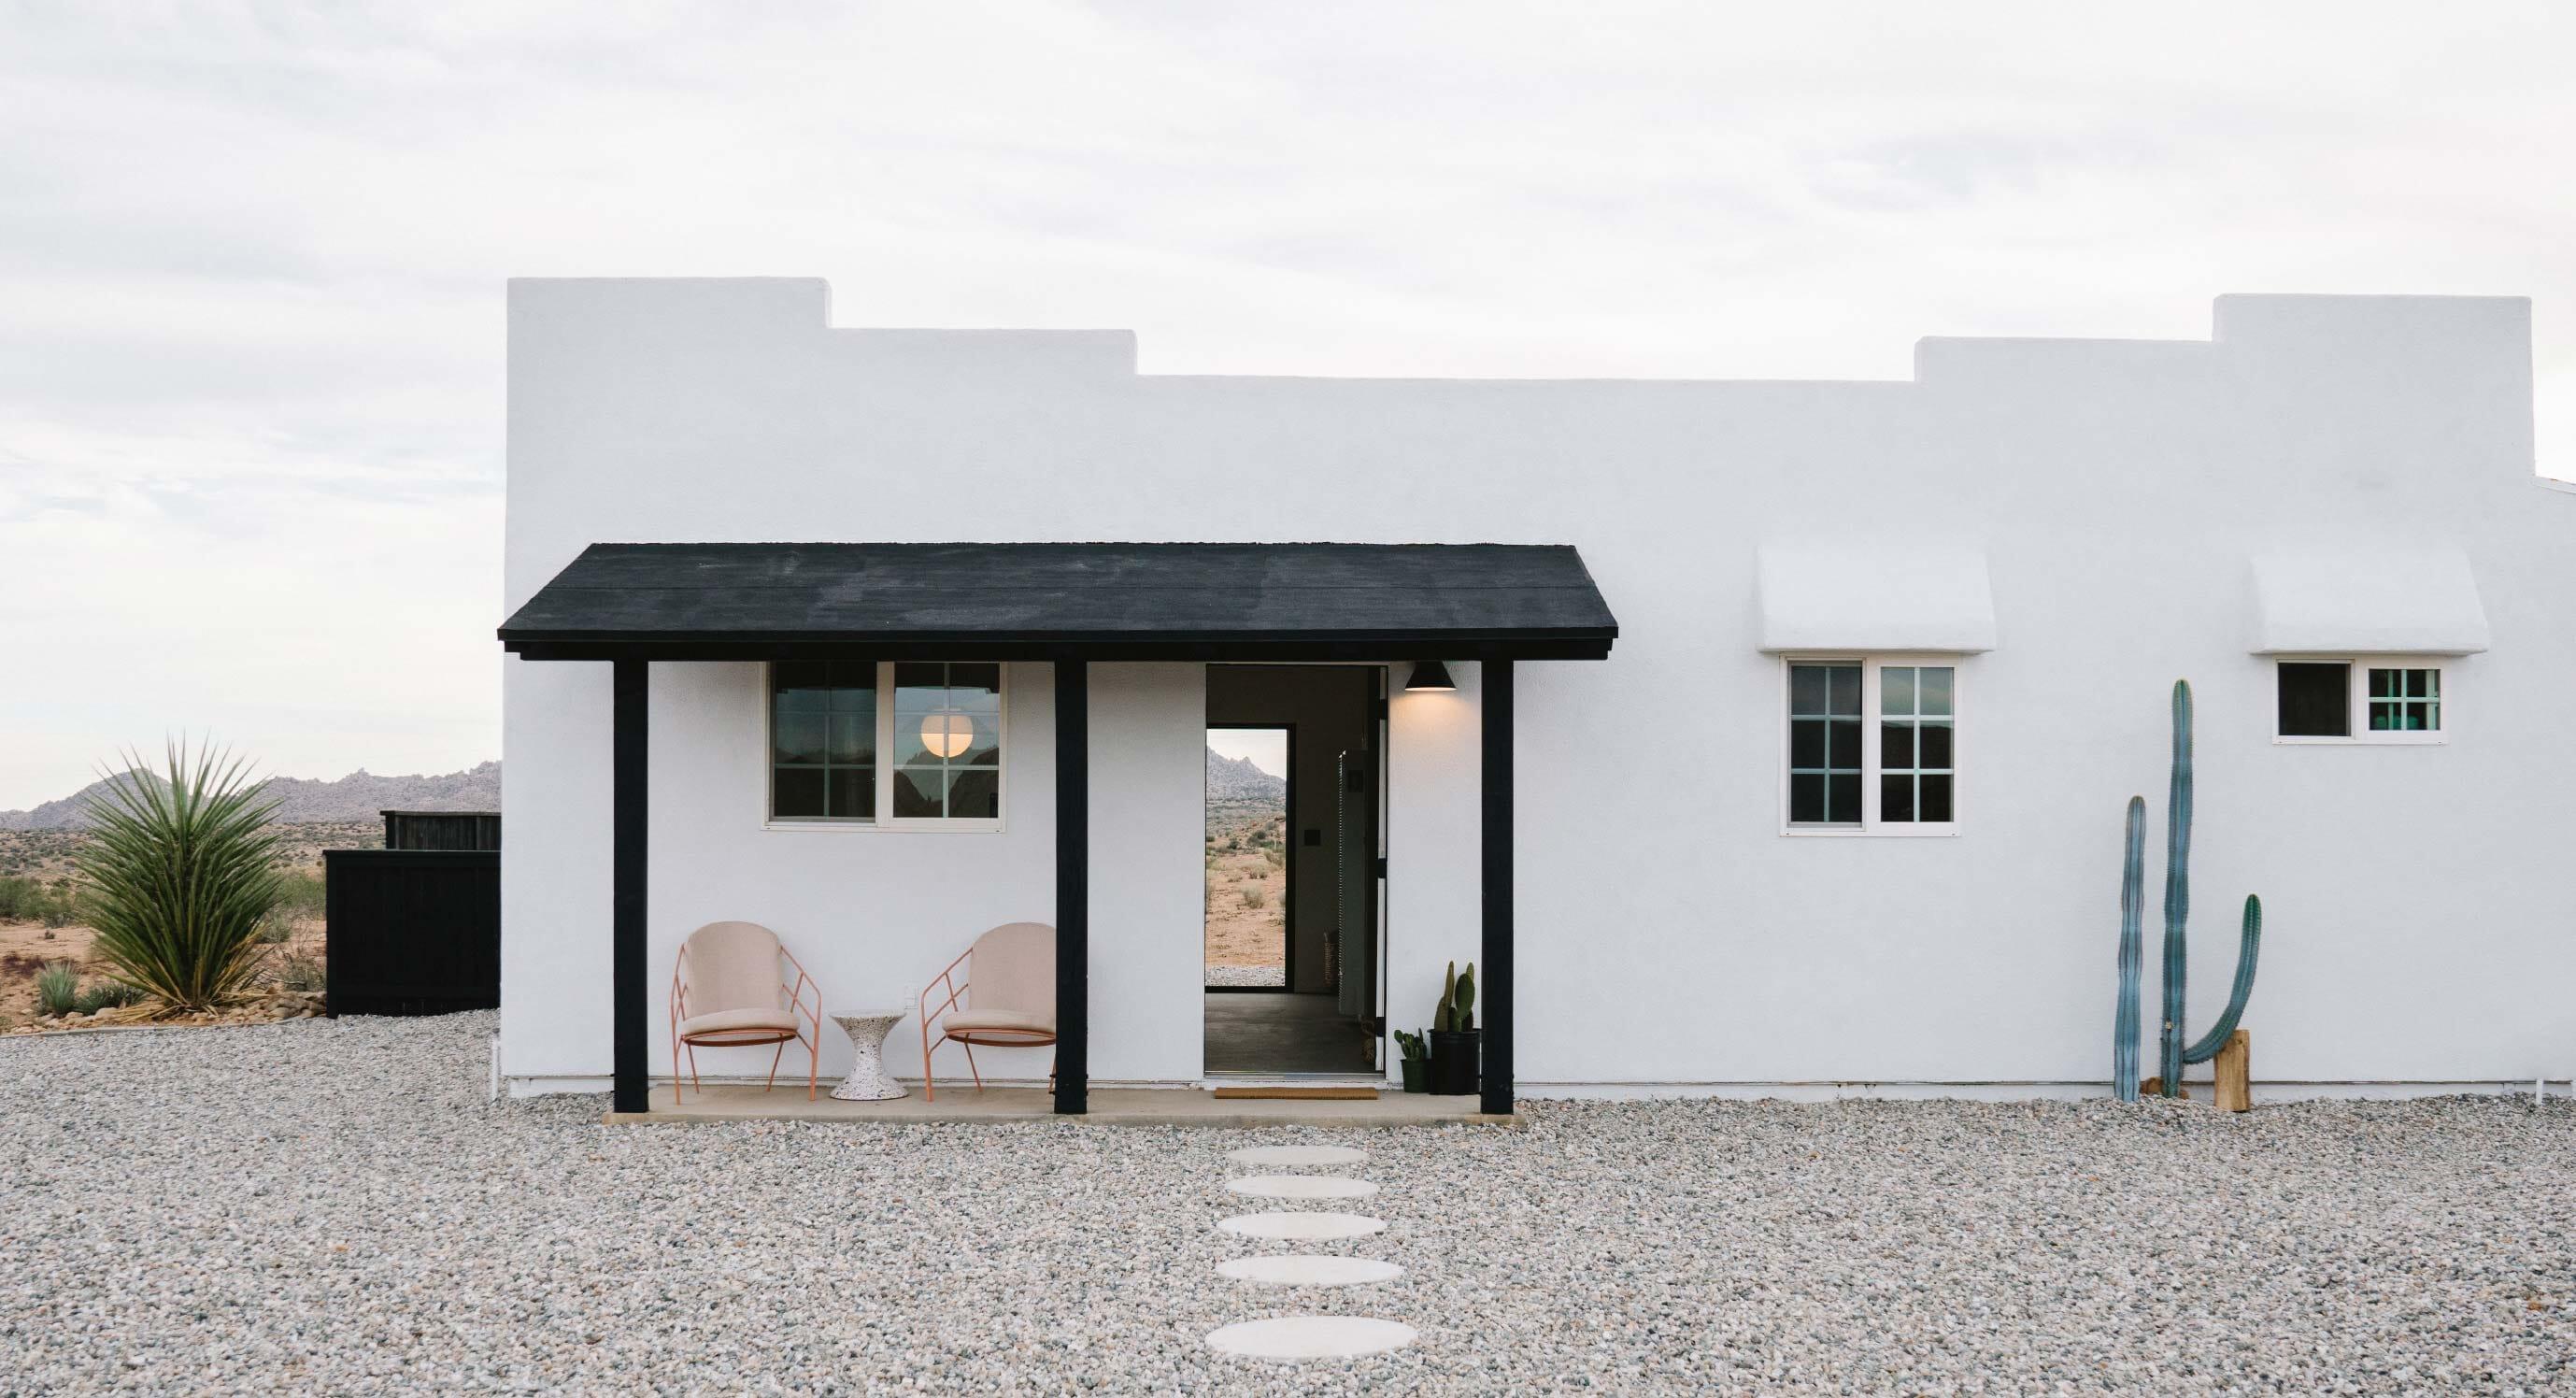 Naude & Brown's Casa Mami Rethinks Retail And Desert Getaways